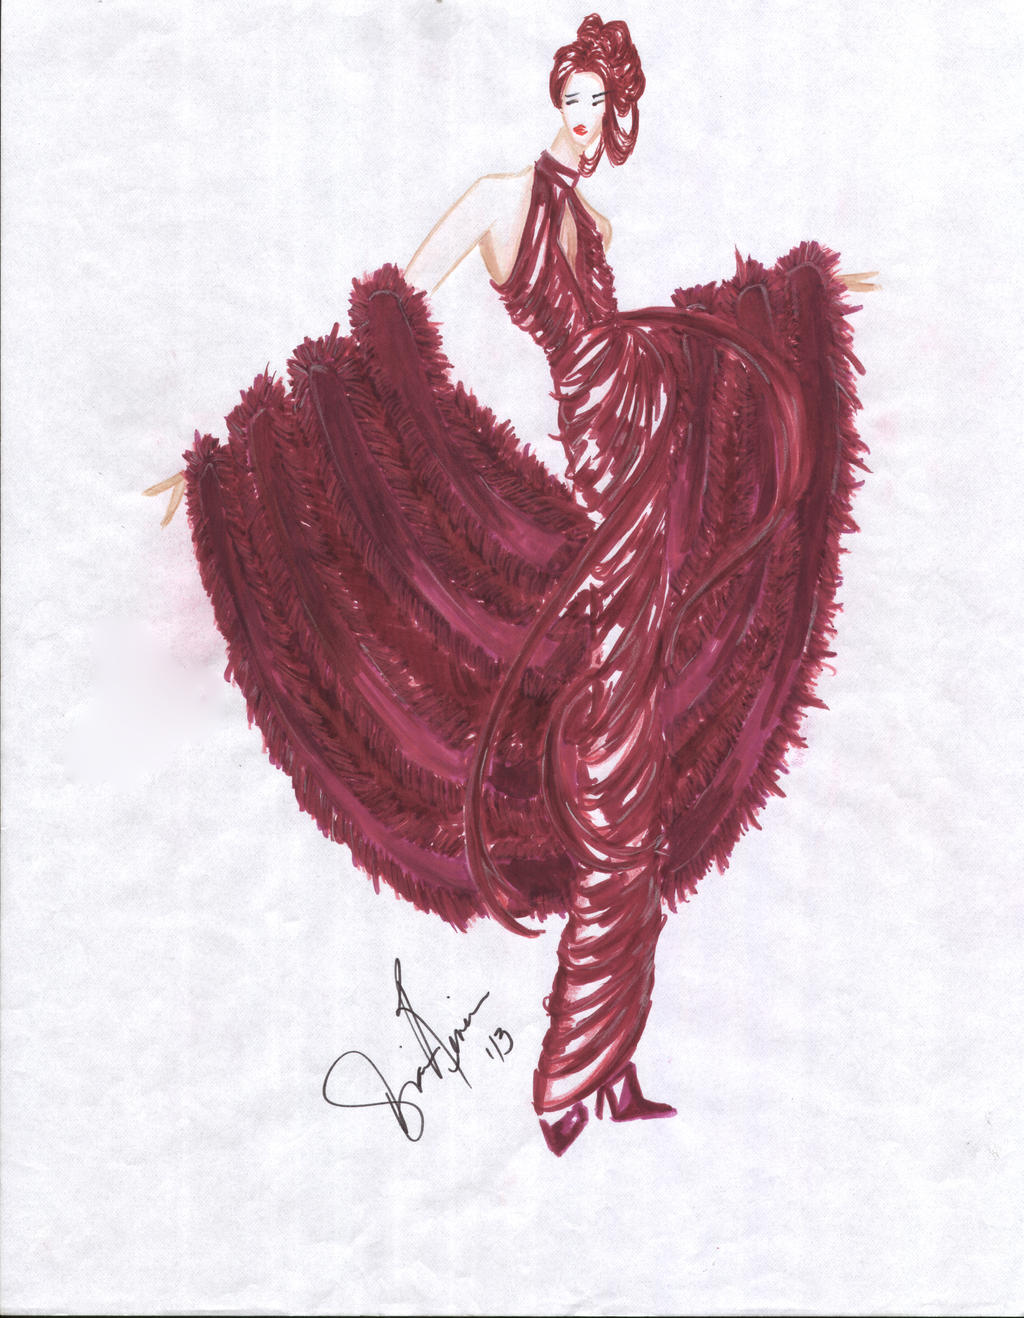 Grecian Drape Dress with Fur Stole by shadowsphere21